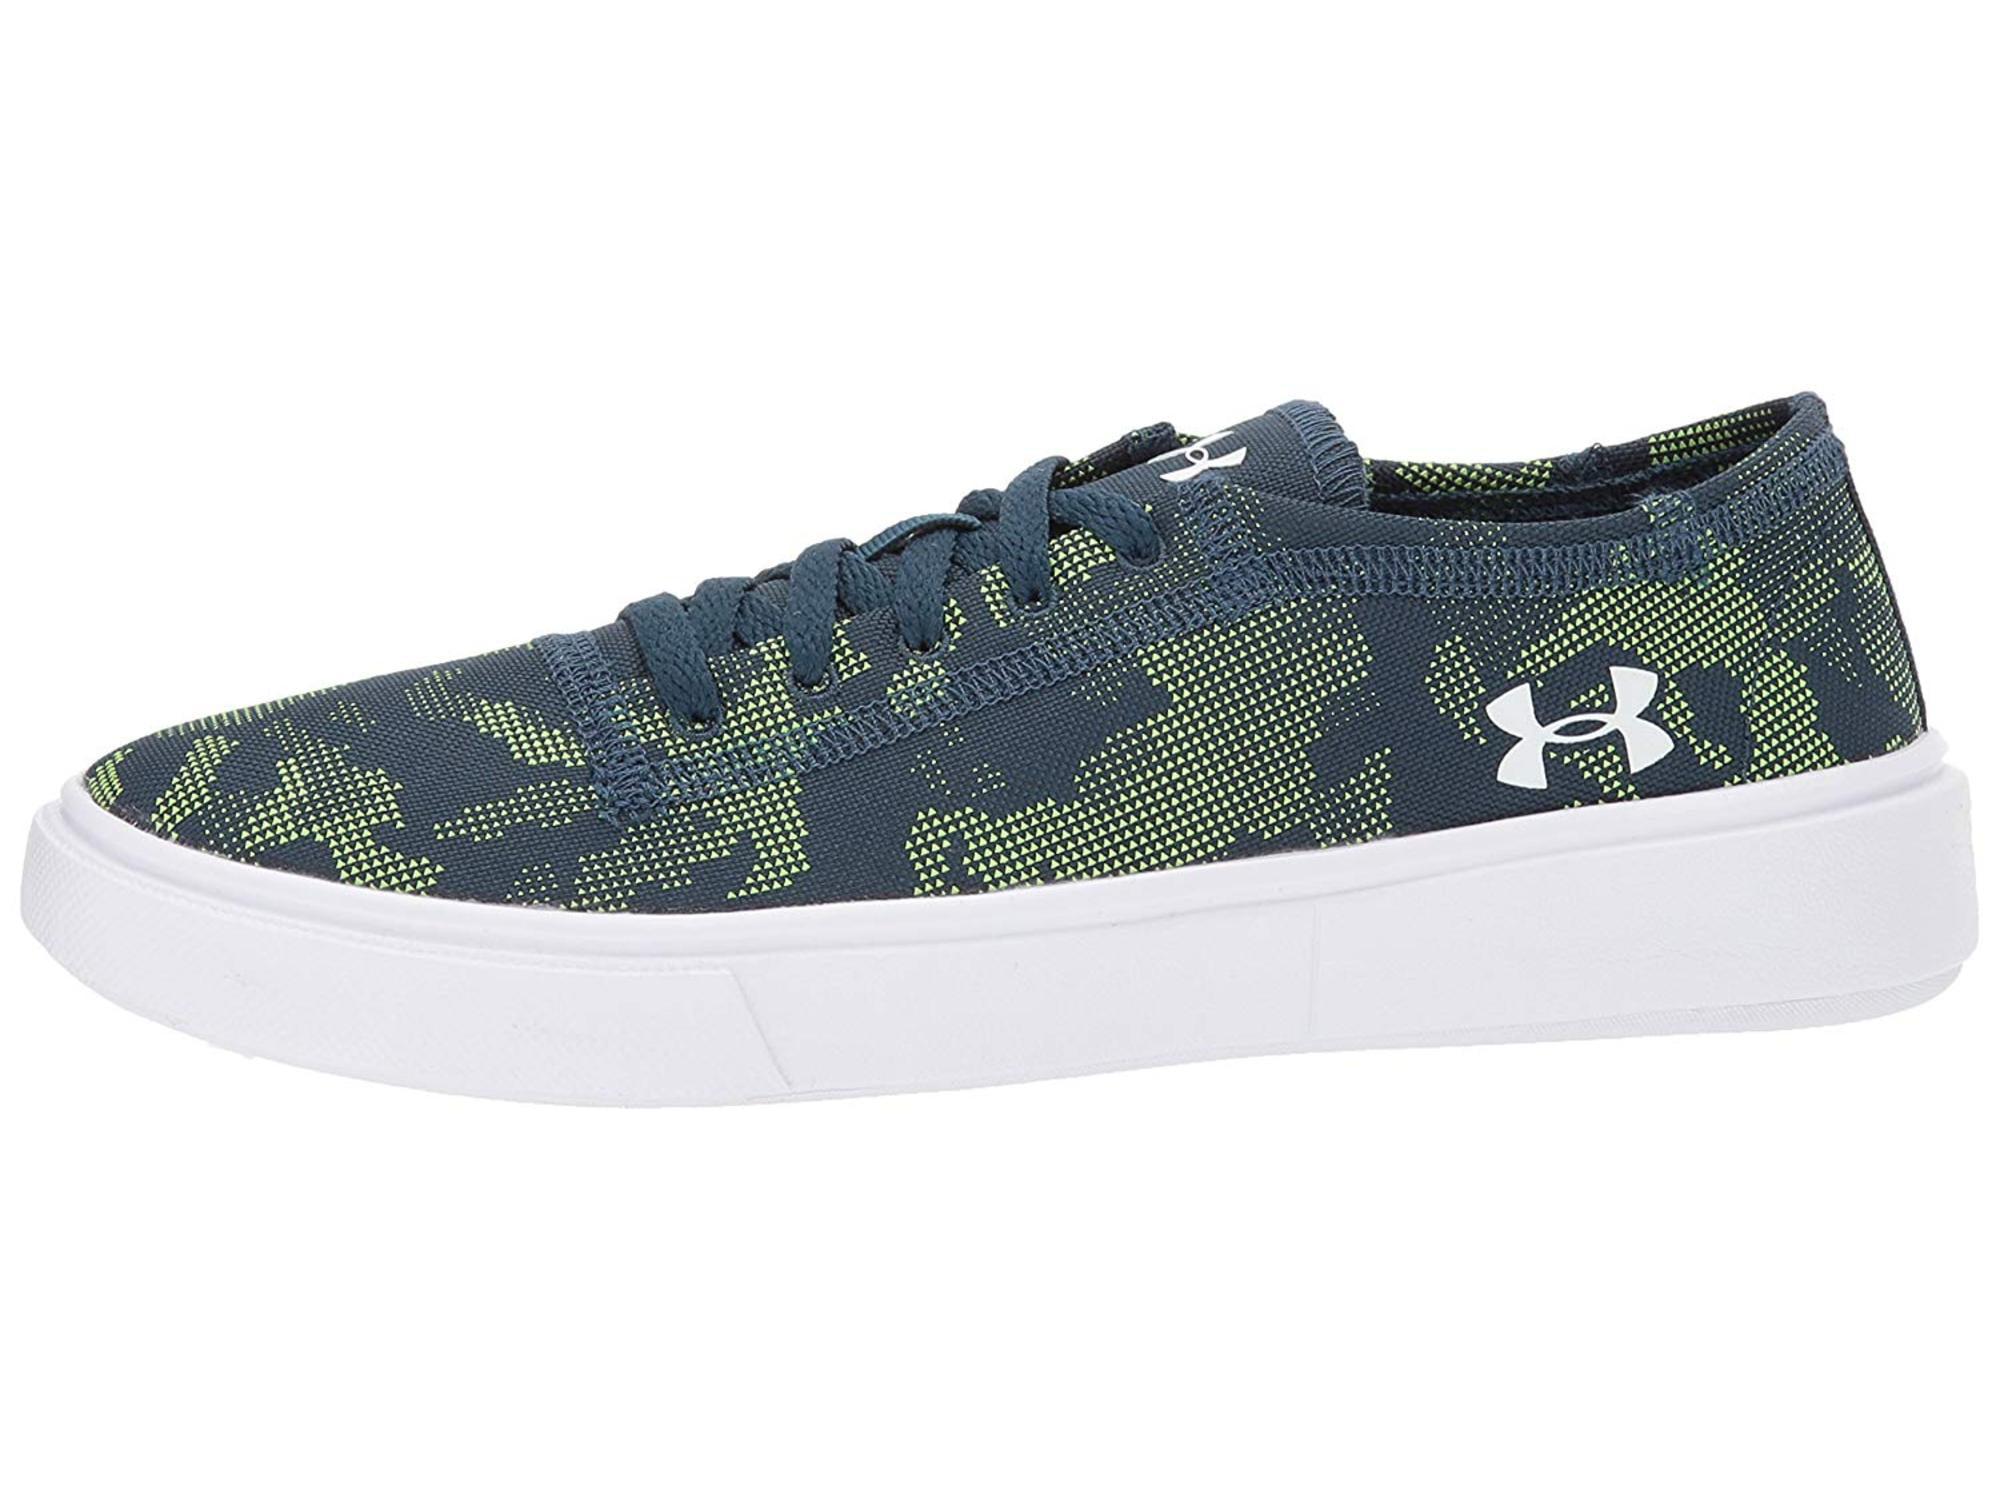 3db0f72c965c09 Girls Shoes